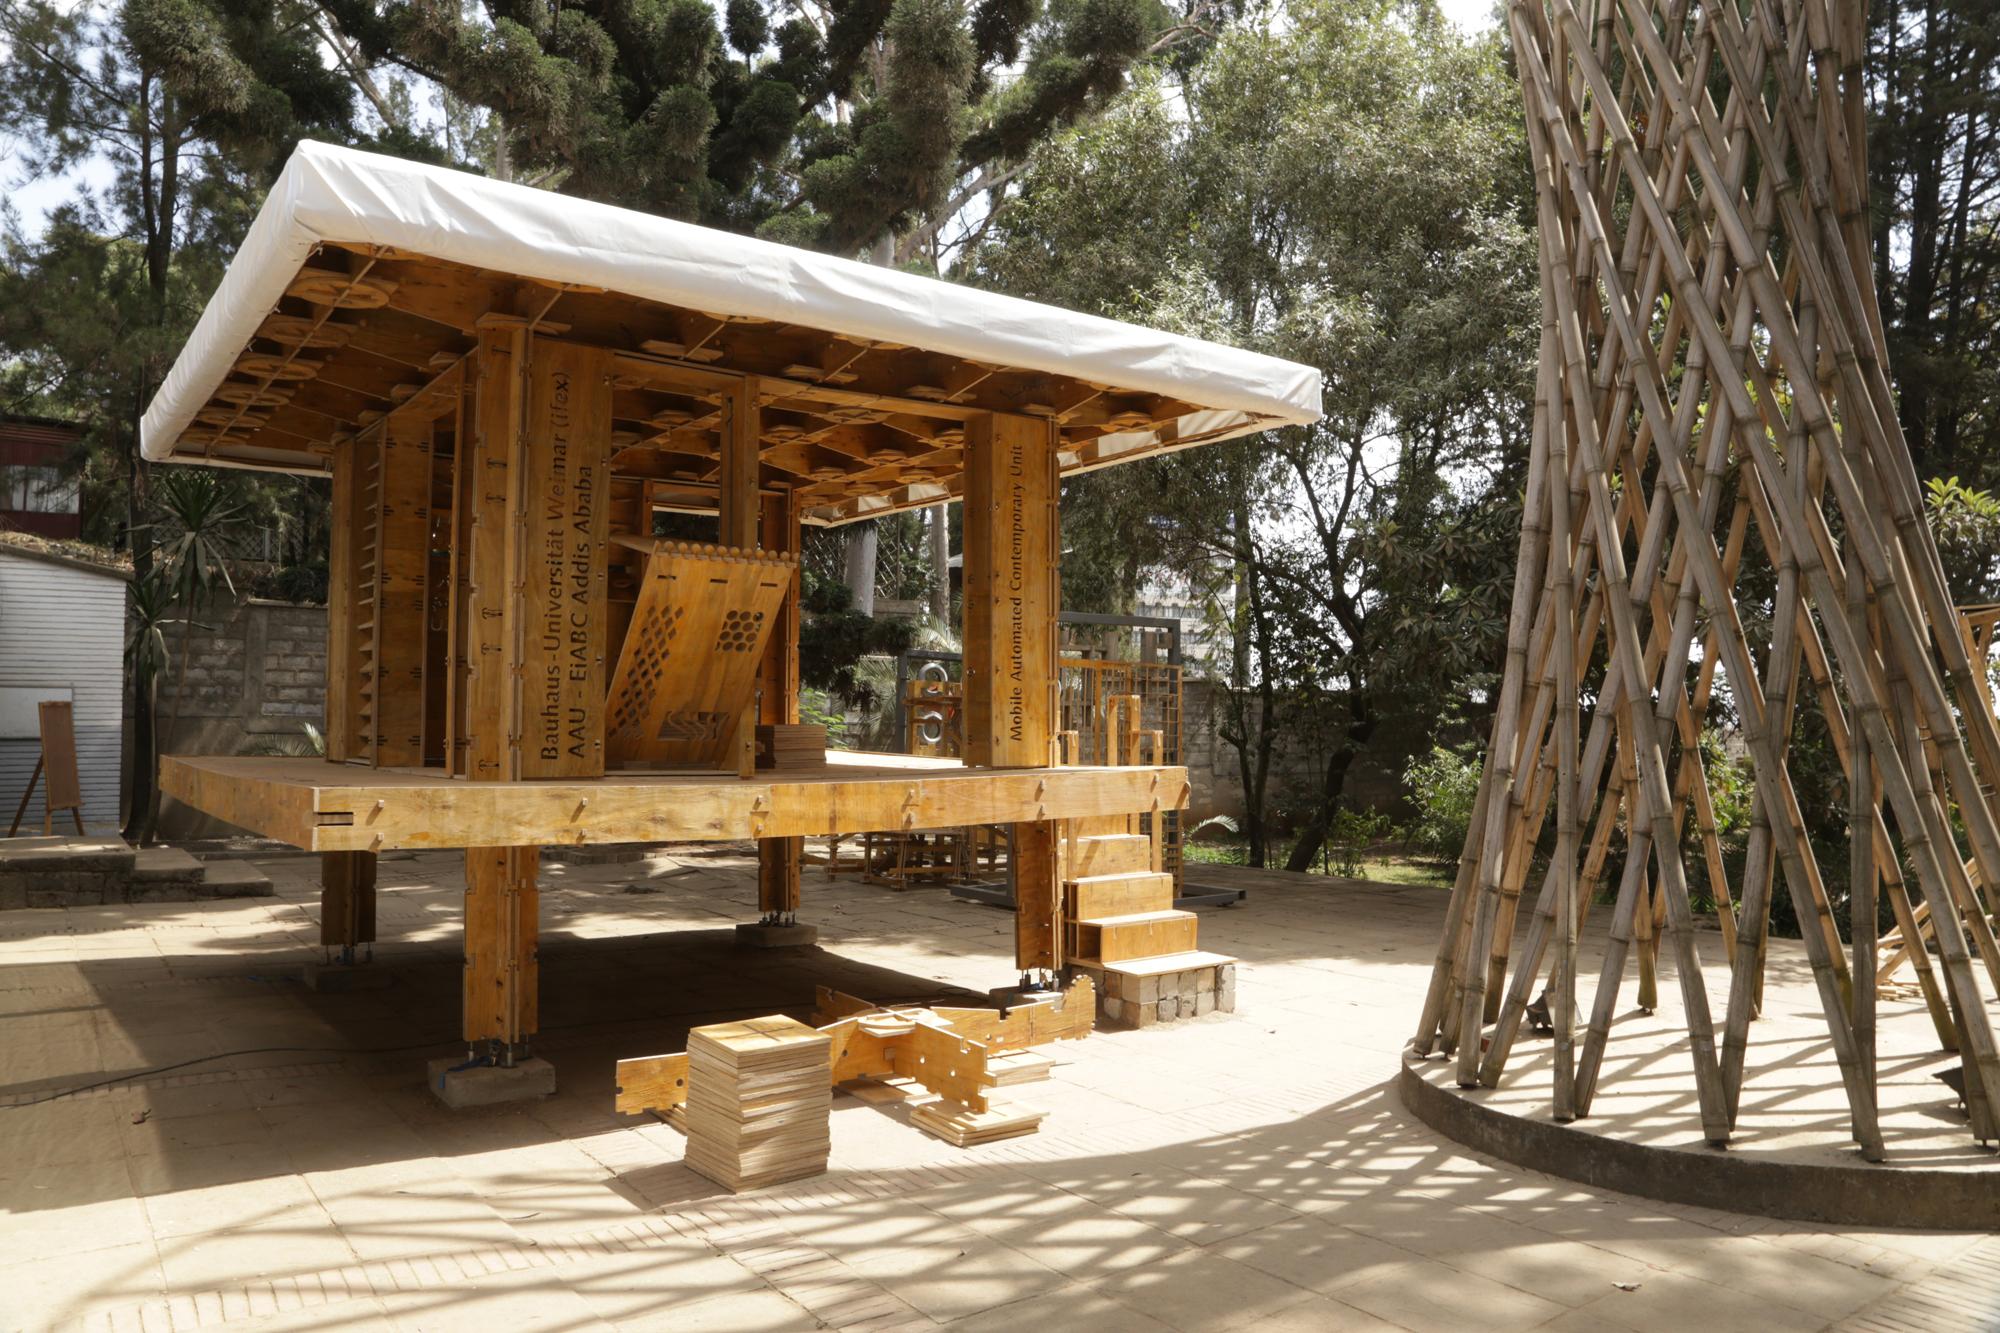 3 experimental homes address hyper urbanization in africa - Construcciones de casas modernas ...